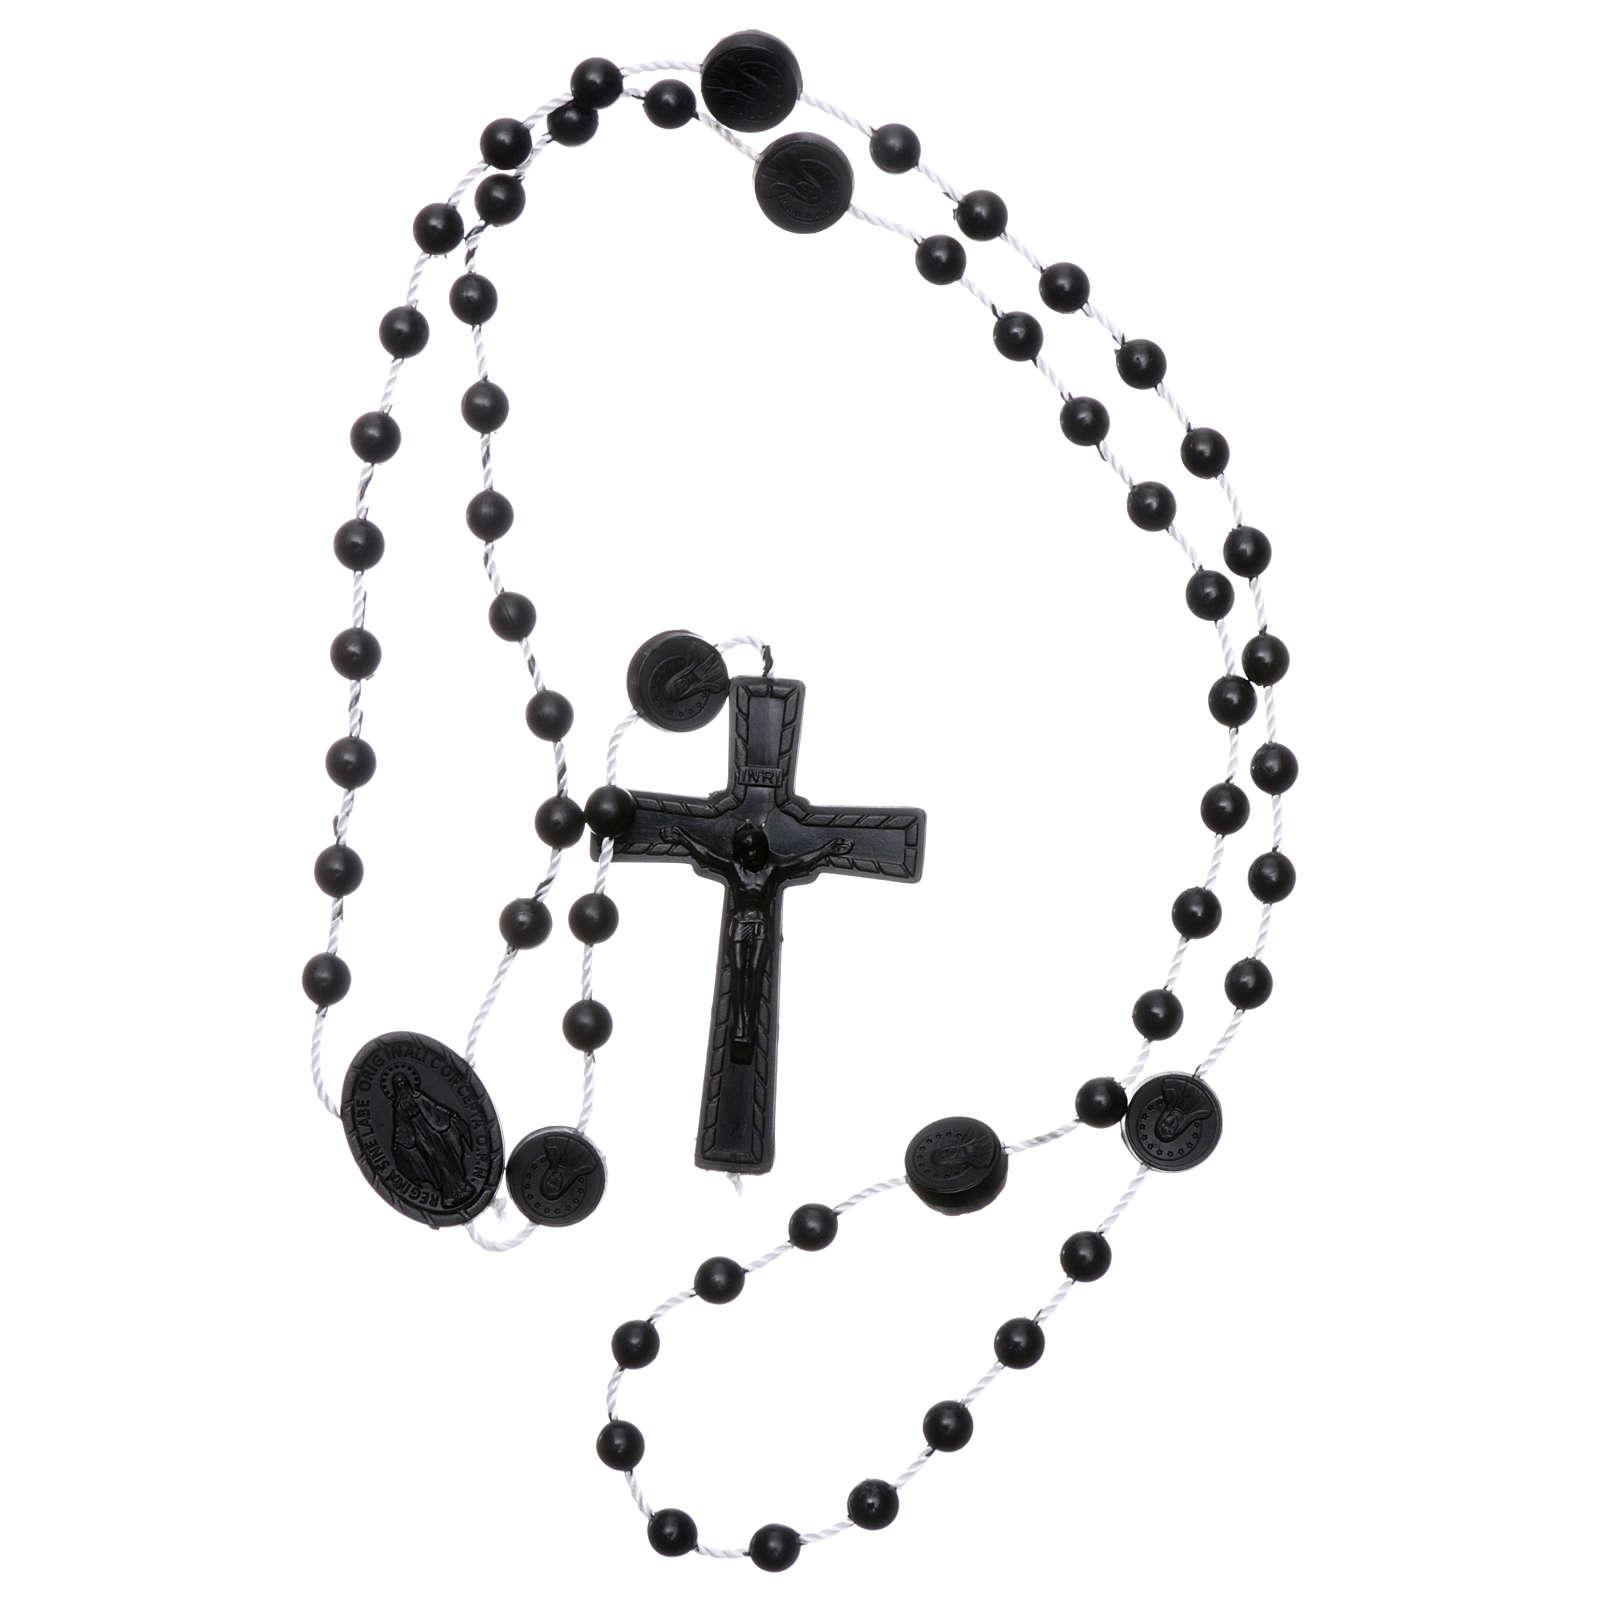 Chapelet noir nylon Vierge Miraculeuse 4